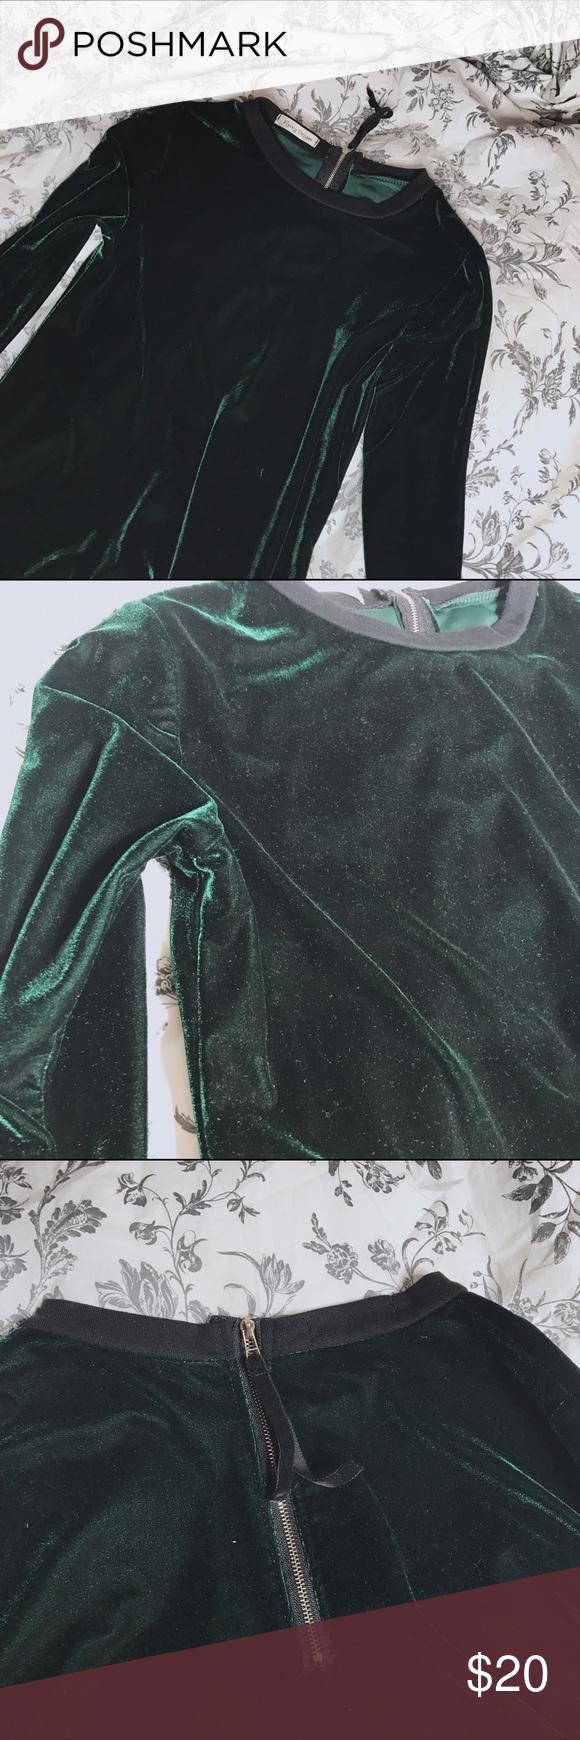 Green Velvet top Beautiful green velvet top. Zipper on the back. American Apparel Tops Tees - Long Sleeve